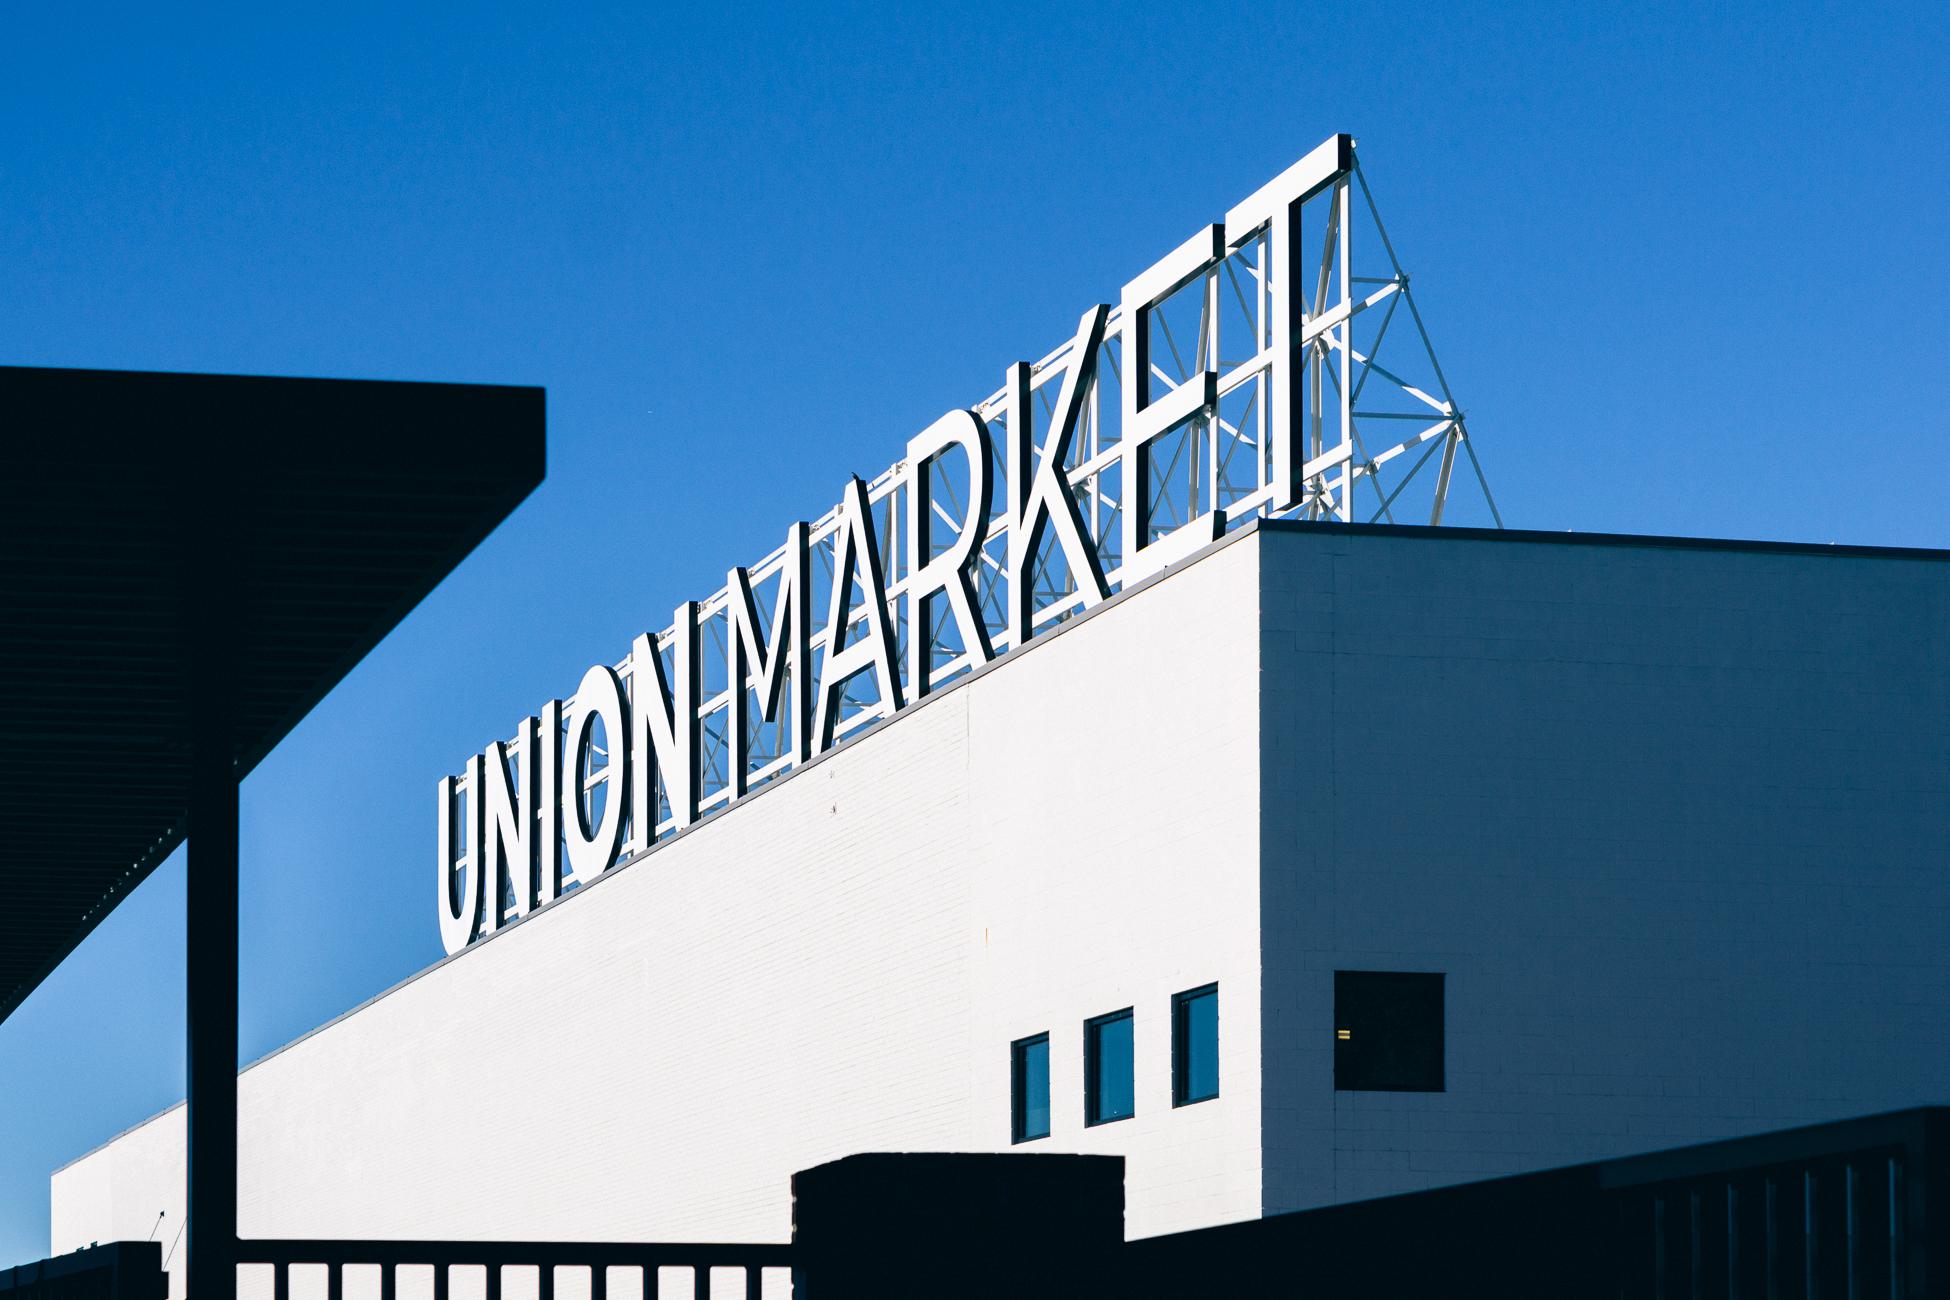 Union Market exterior